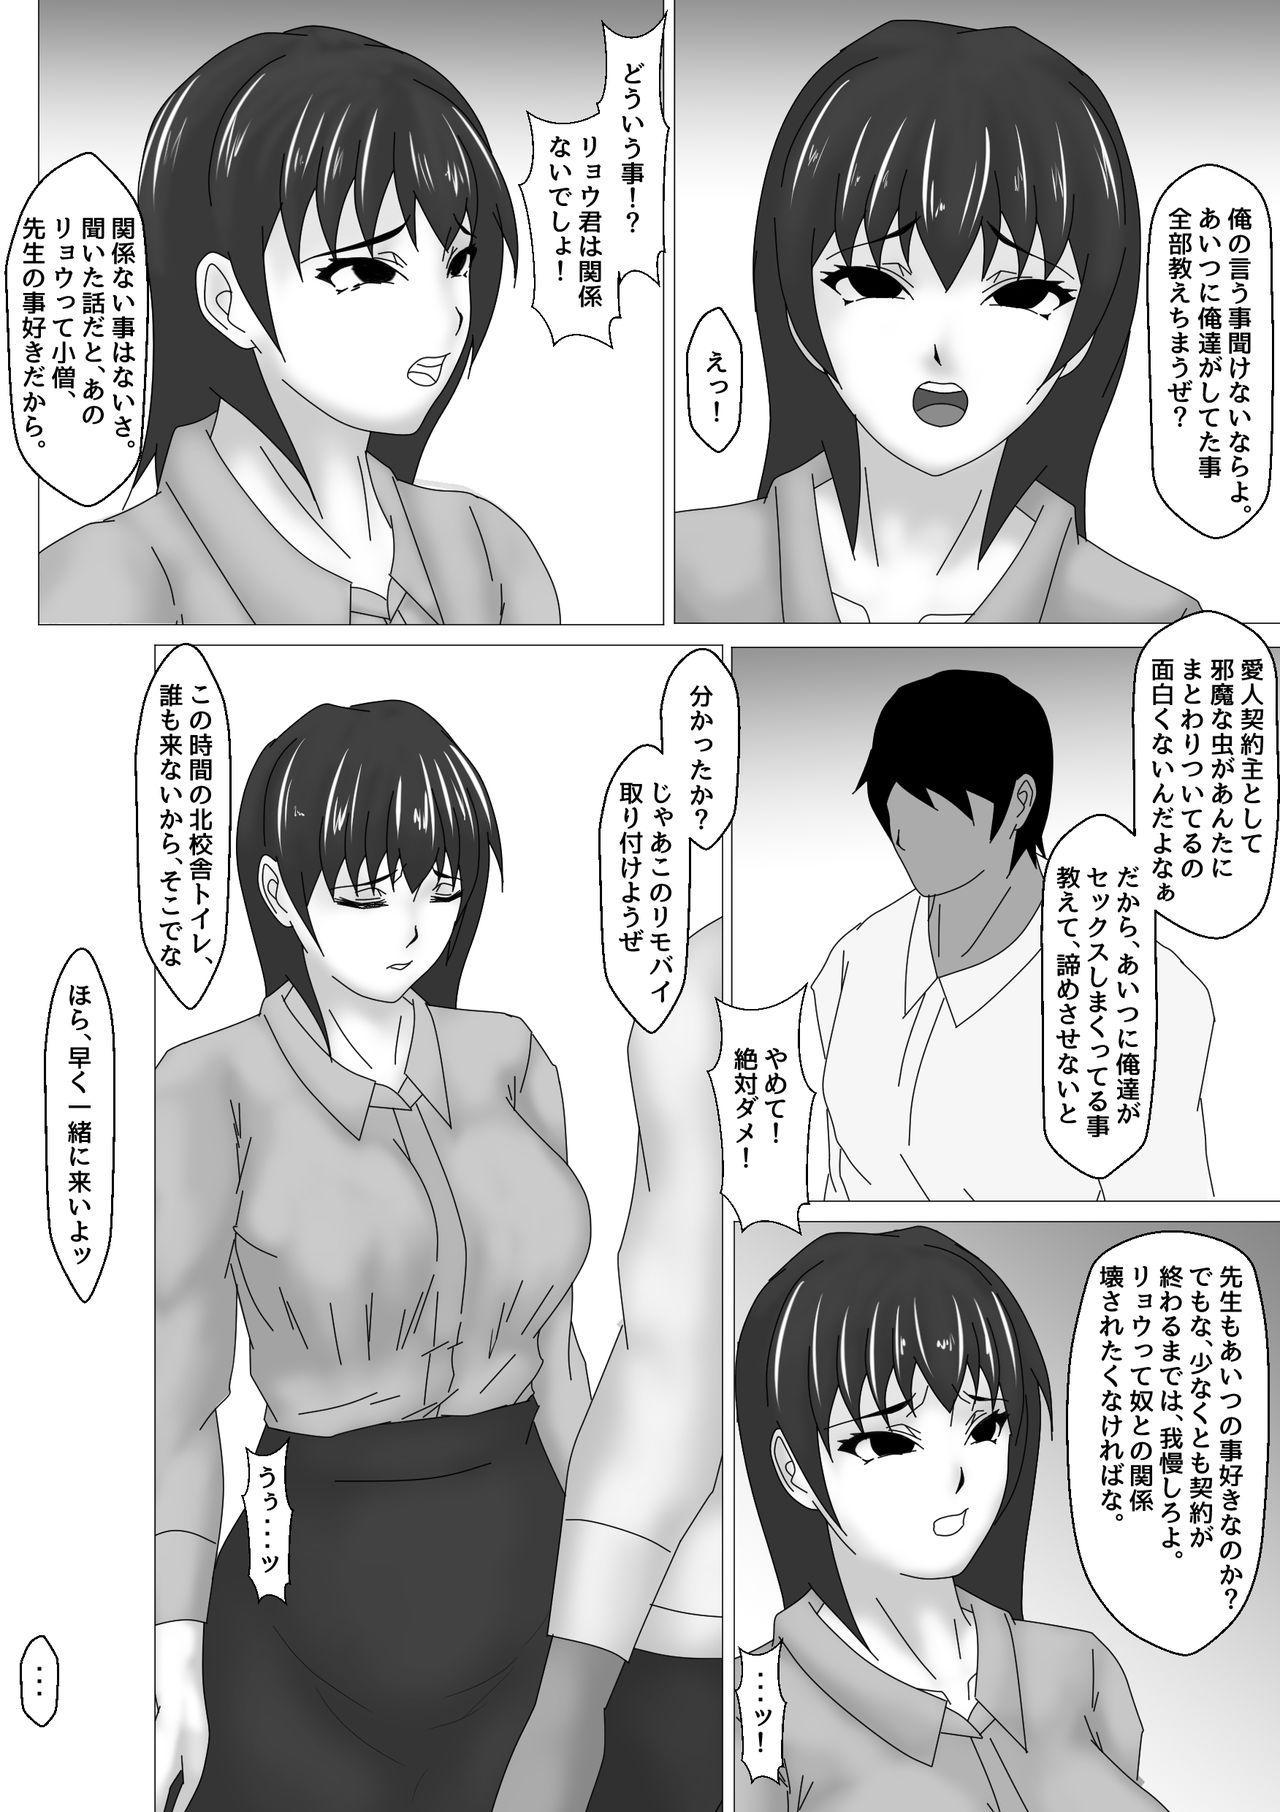 Jokyoushi Shinozaki Rin no Choukyou Kiroku Dai 3 Zenhan | Female Teacher Rin Shinozaki's Training Record 3 First Half 13